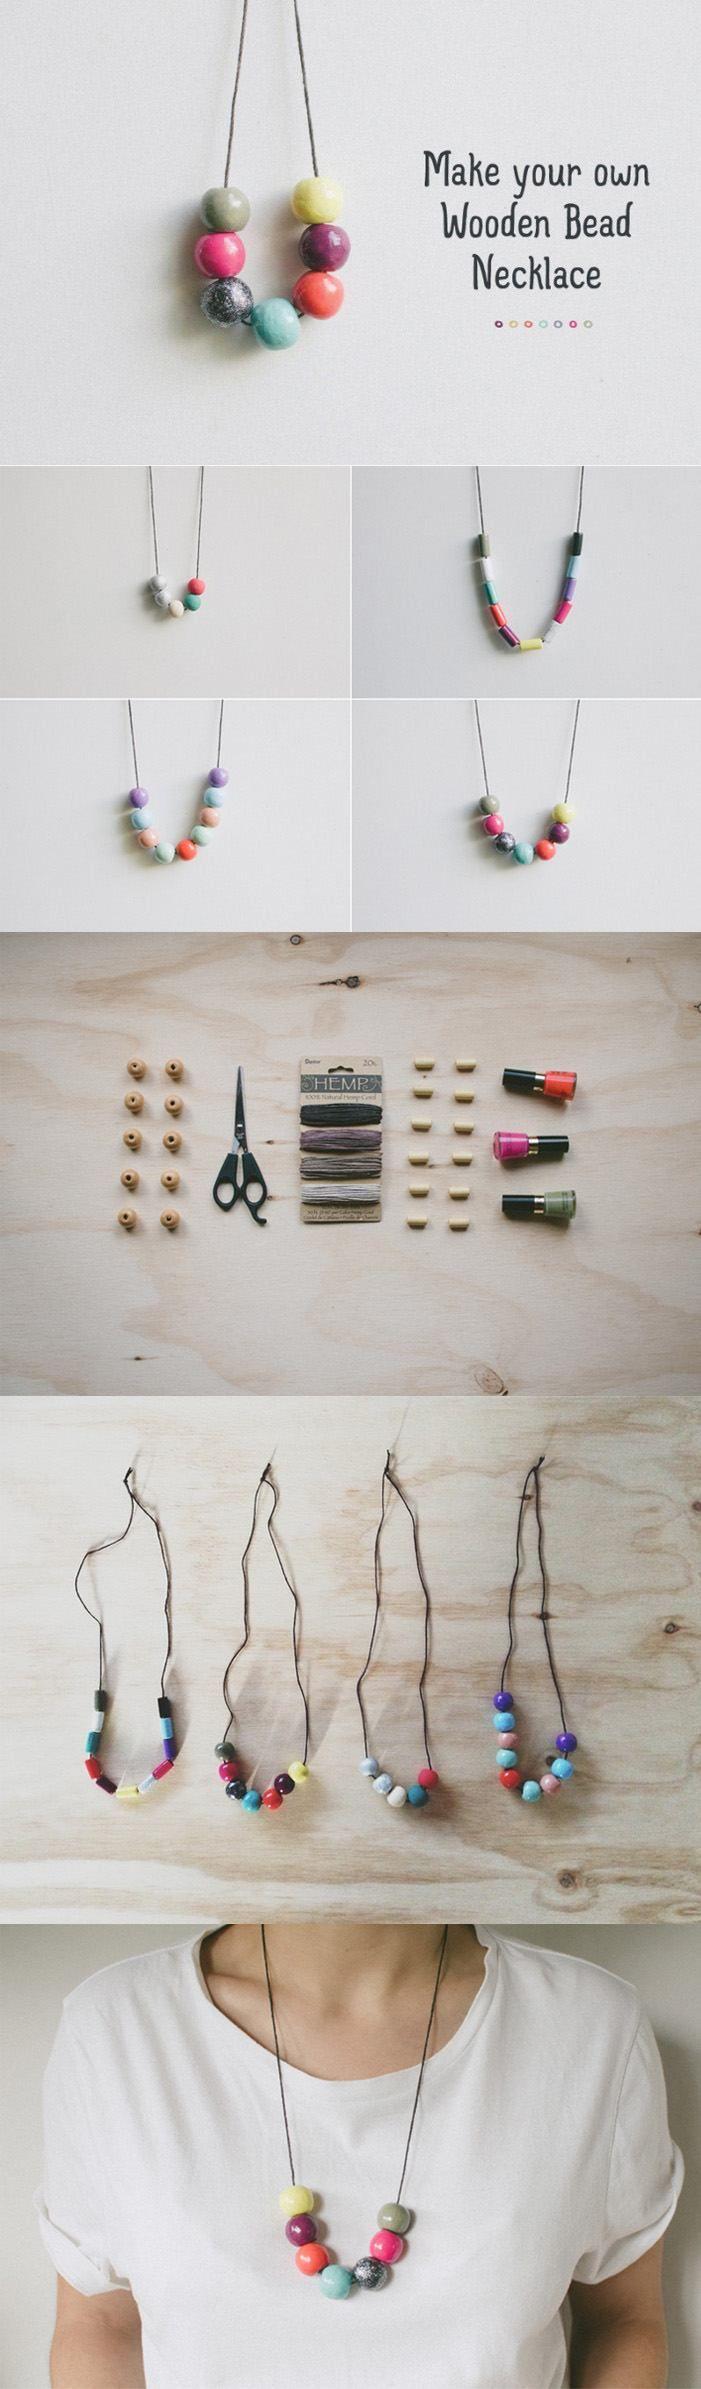 Ingenioso collar DIY - fawnmag.com - DIY Wooden Bead Necklace